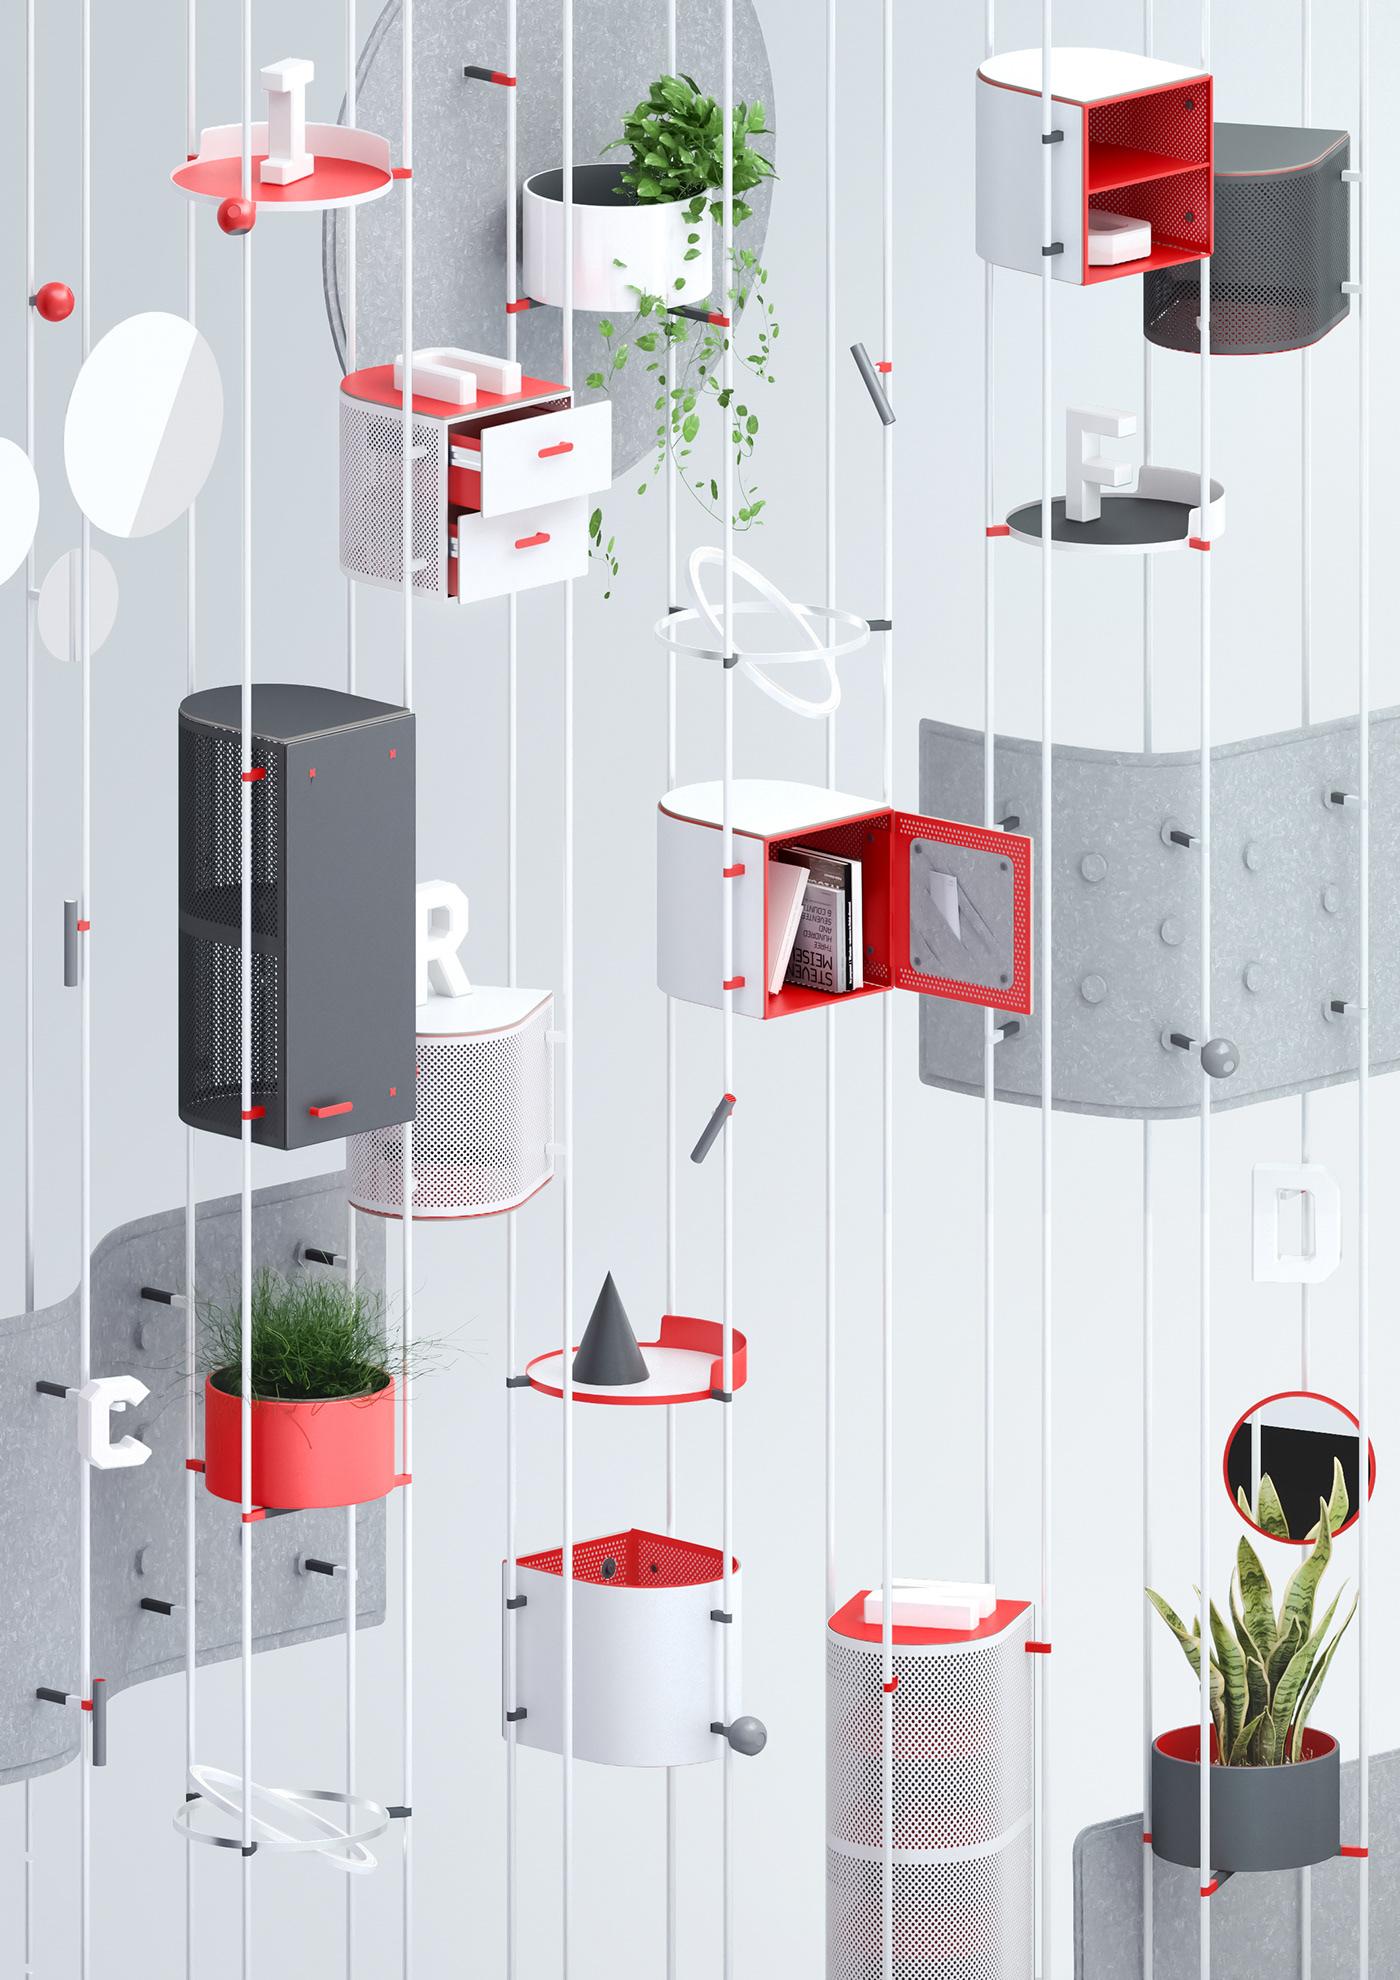 furniture furniture design  illumika Minimalism modern furniture modular product product design  storage